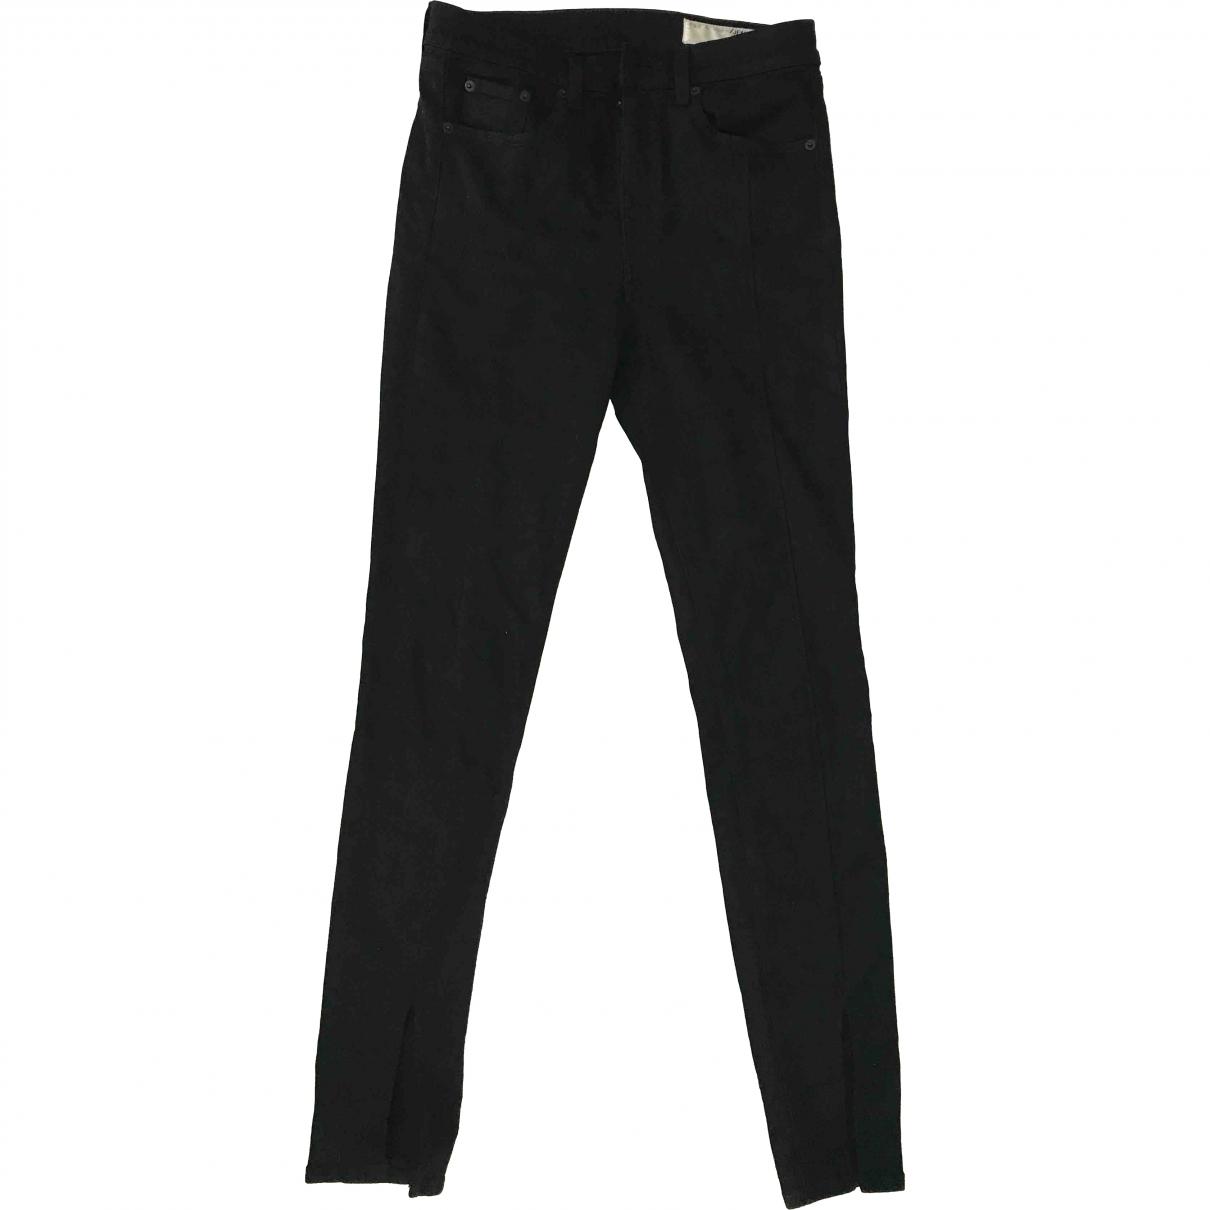 Rag & Bone \N Black Cotton - elasthane Jeans for Women 27 US